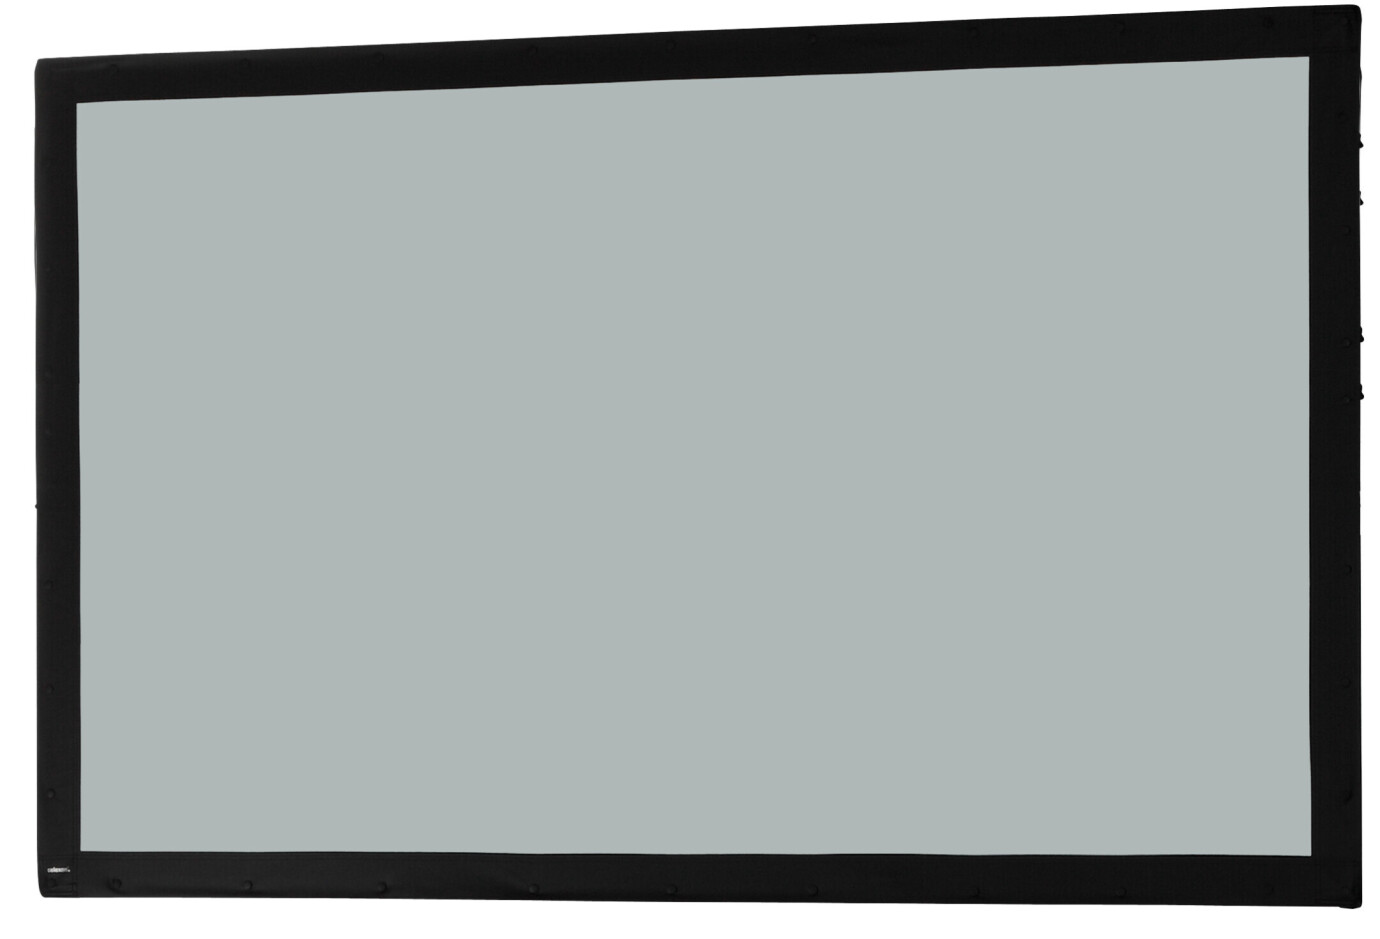 celexon Tuch für Faltrahmen Mobil Expert - 244 x 152 cm Rückprojektion